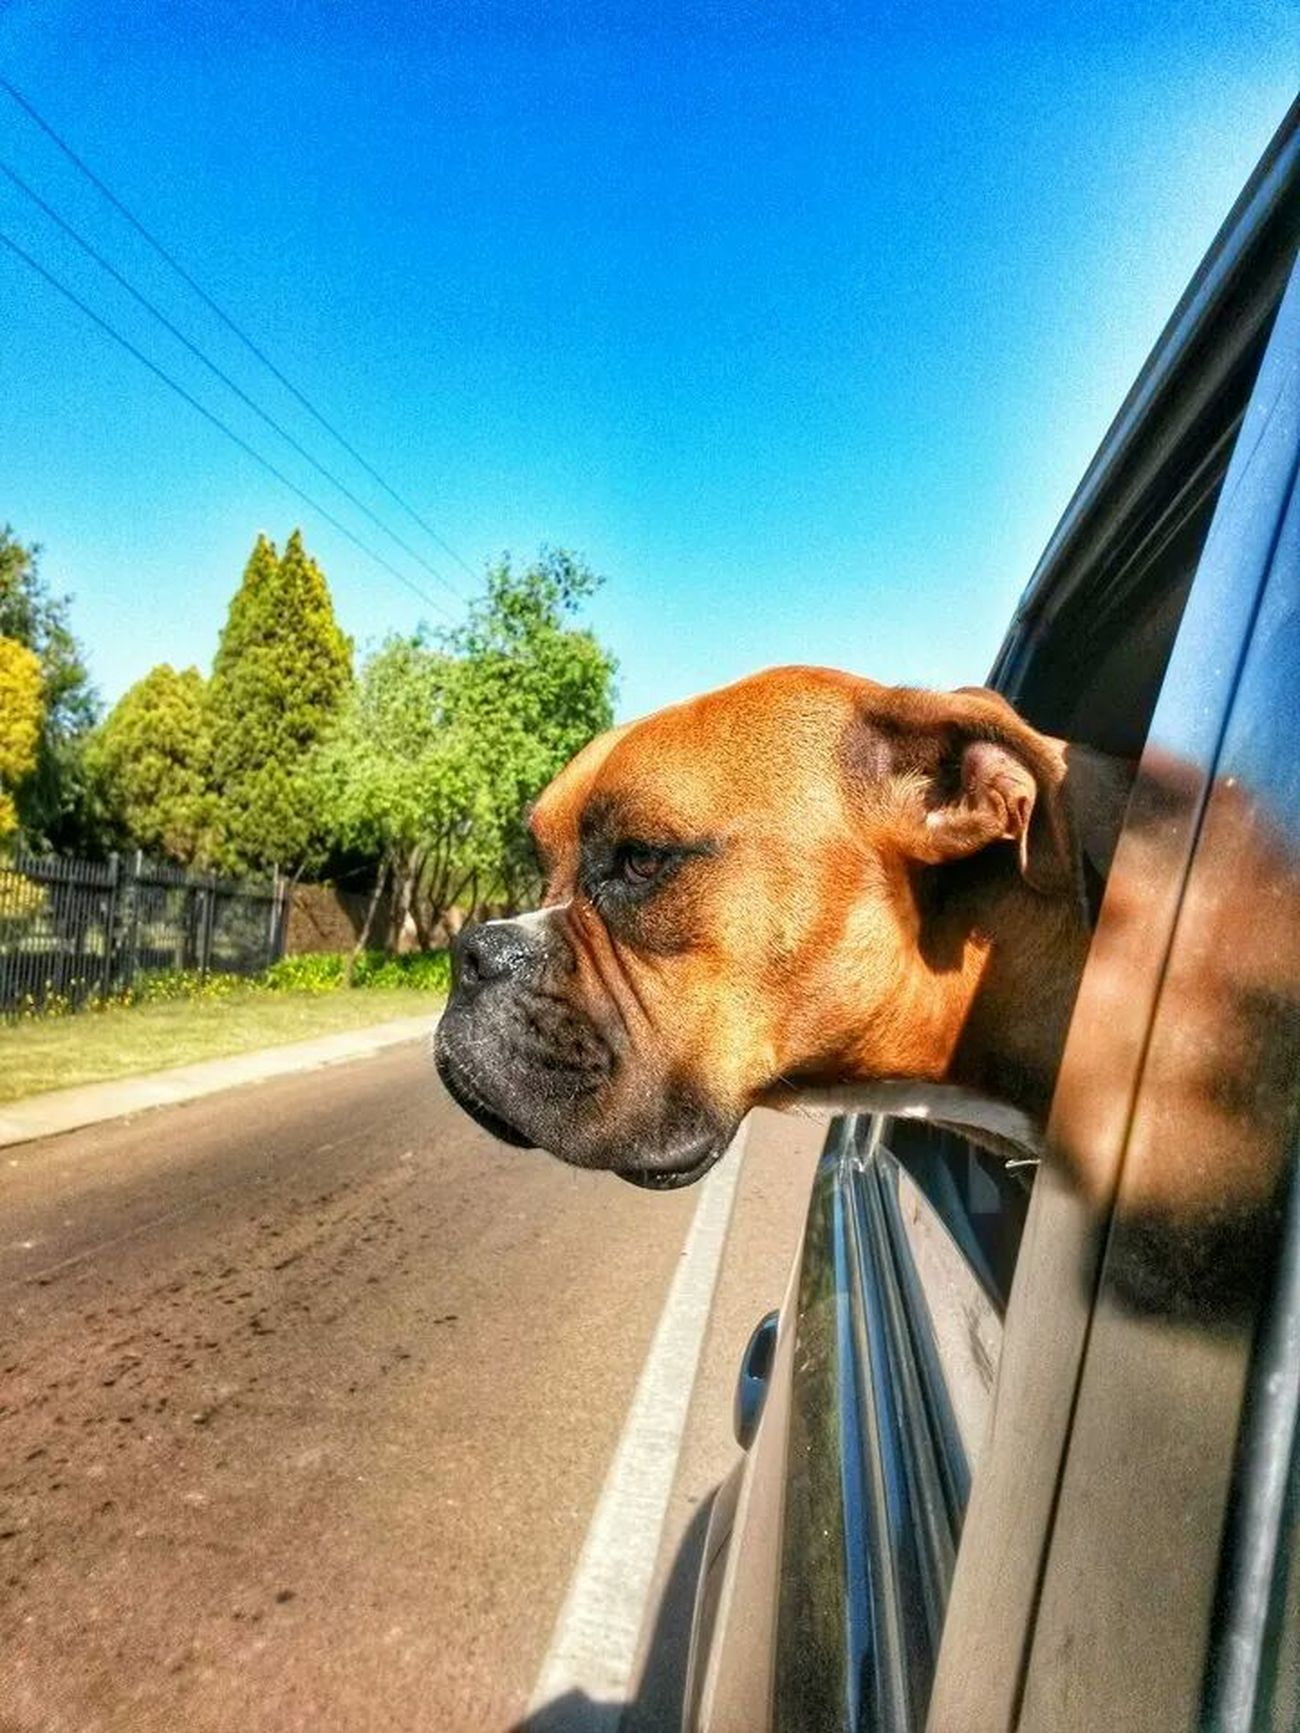 Dog Buster Bulldog Taking Photos